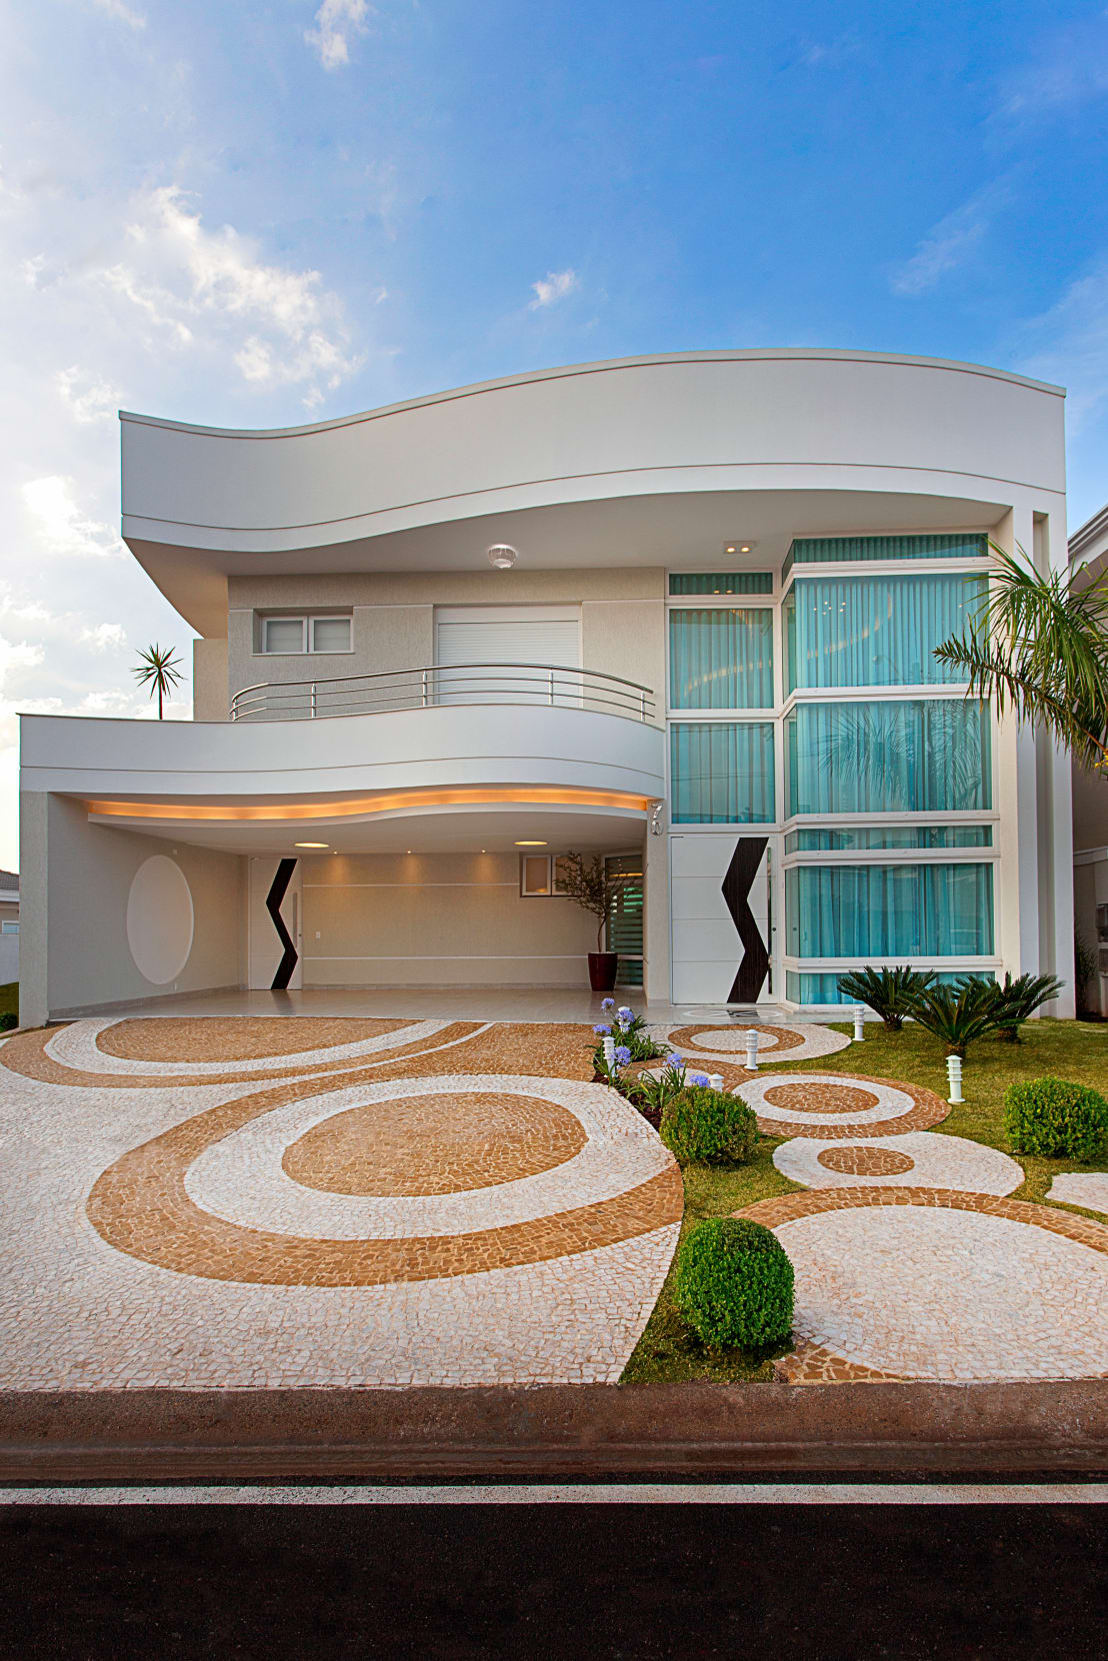 Casa villa lobos by arquiteto aquiles n colas k laris homify - Camas pegadas ala pared ...